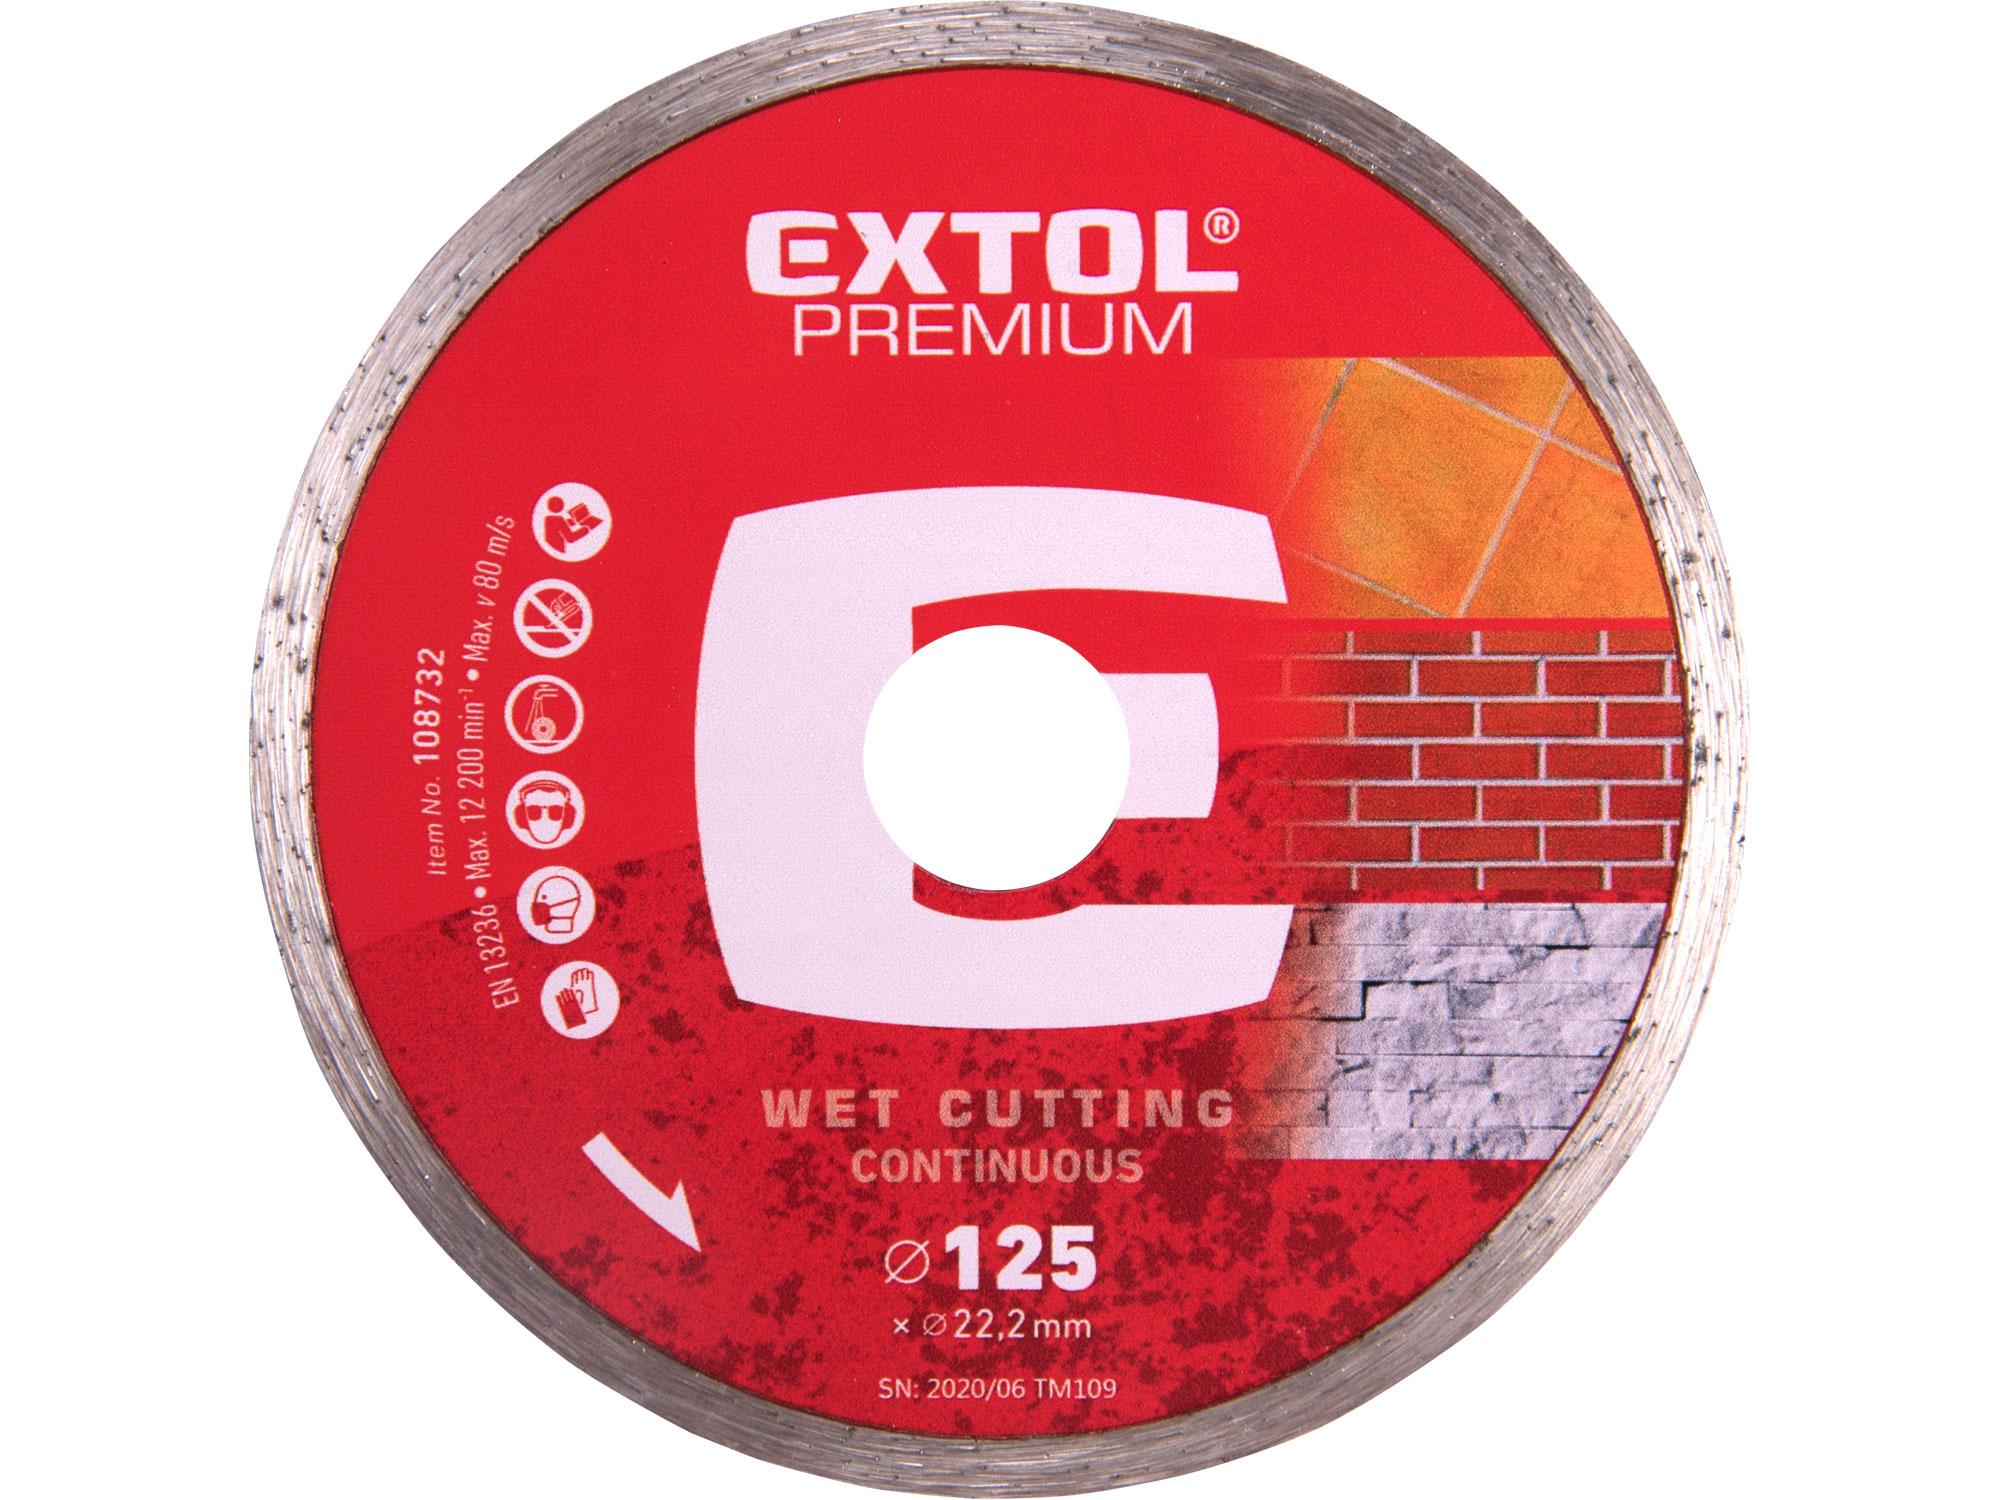 125mm Diamond Cutting Disc Wet Type, 125mm Dia. 22.2mm ID, 2mm thk